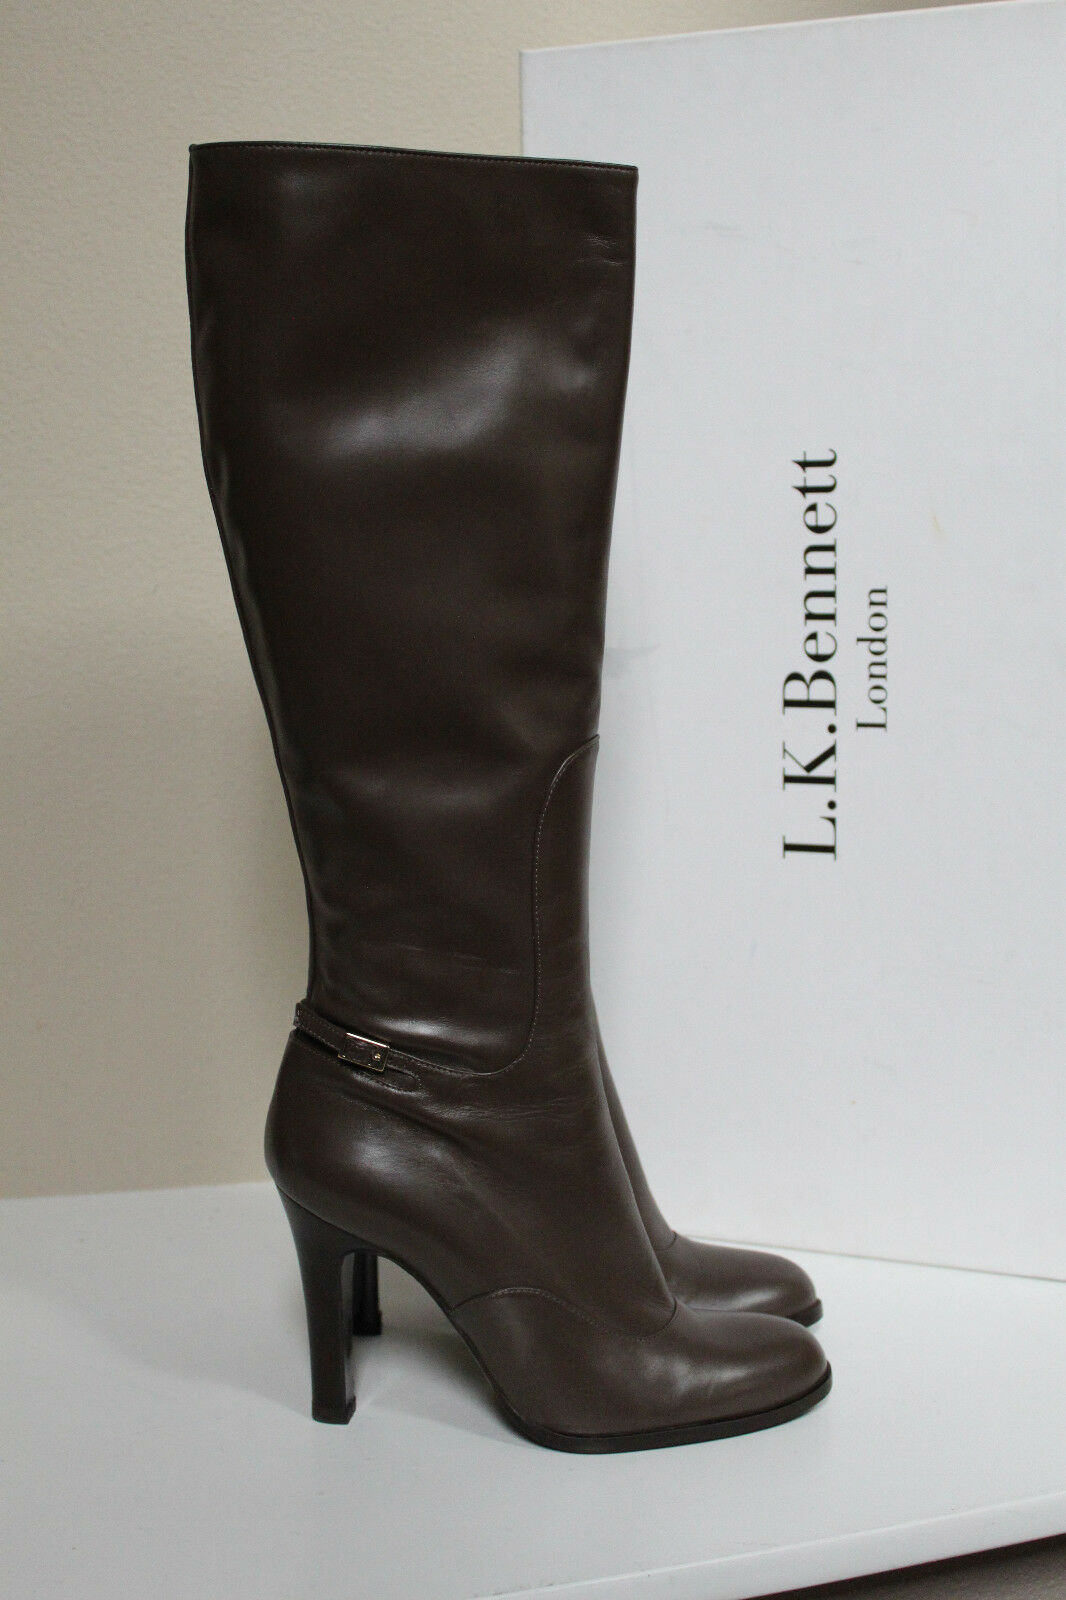 Nouveau sz 9.5 39.5 L. K. Bennett London Angela Dark amande cuir Tall démarrage chaussures